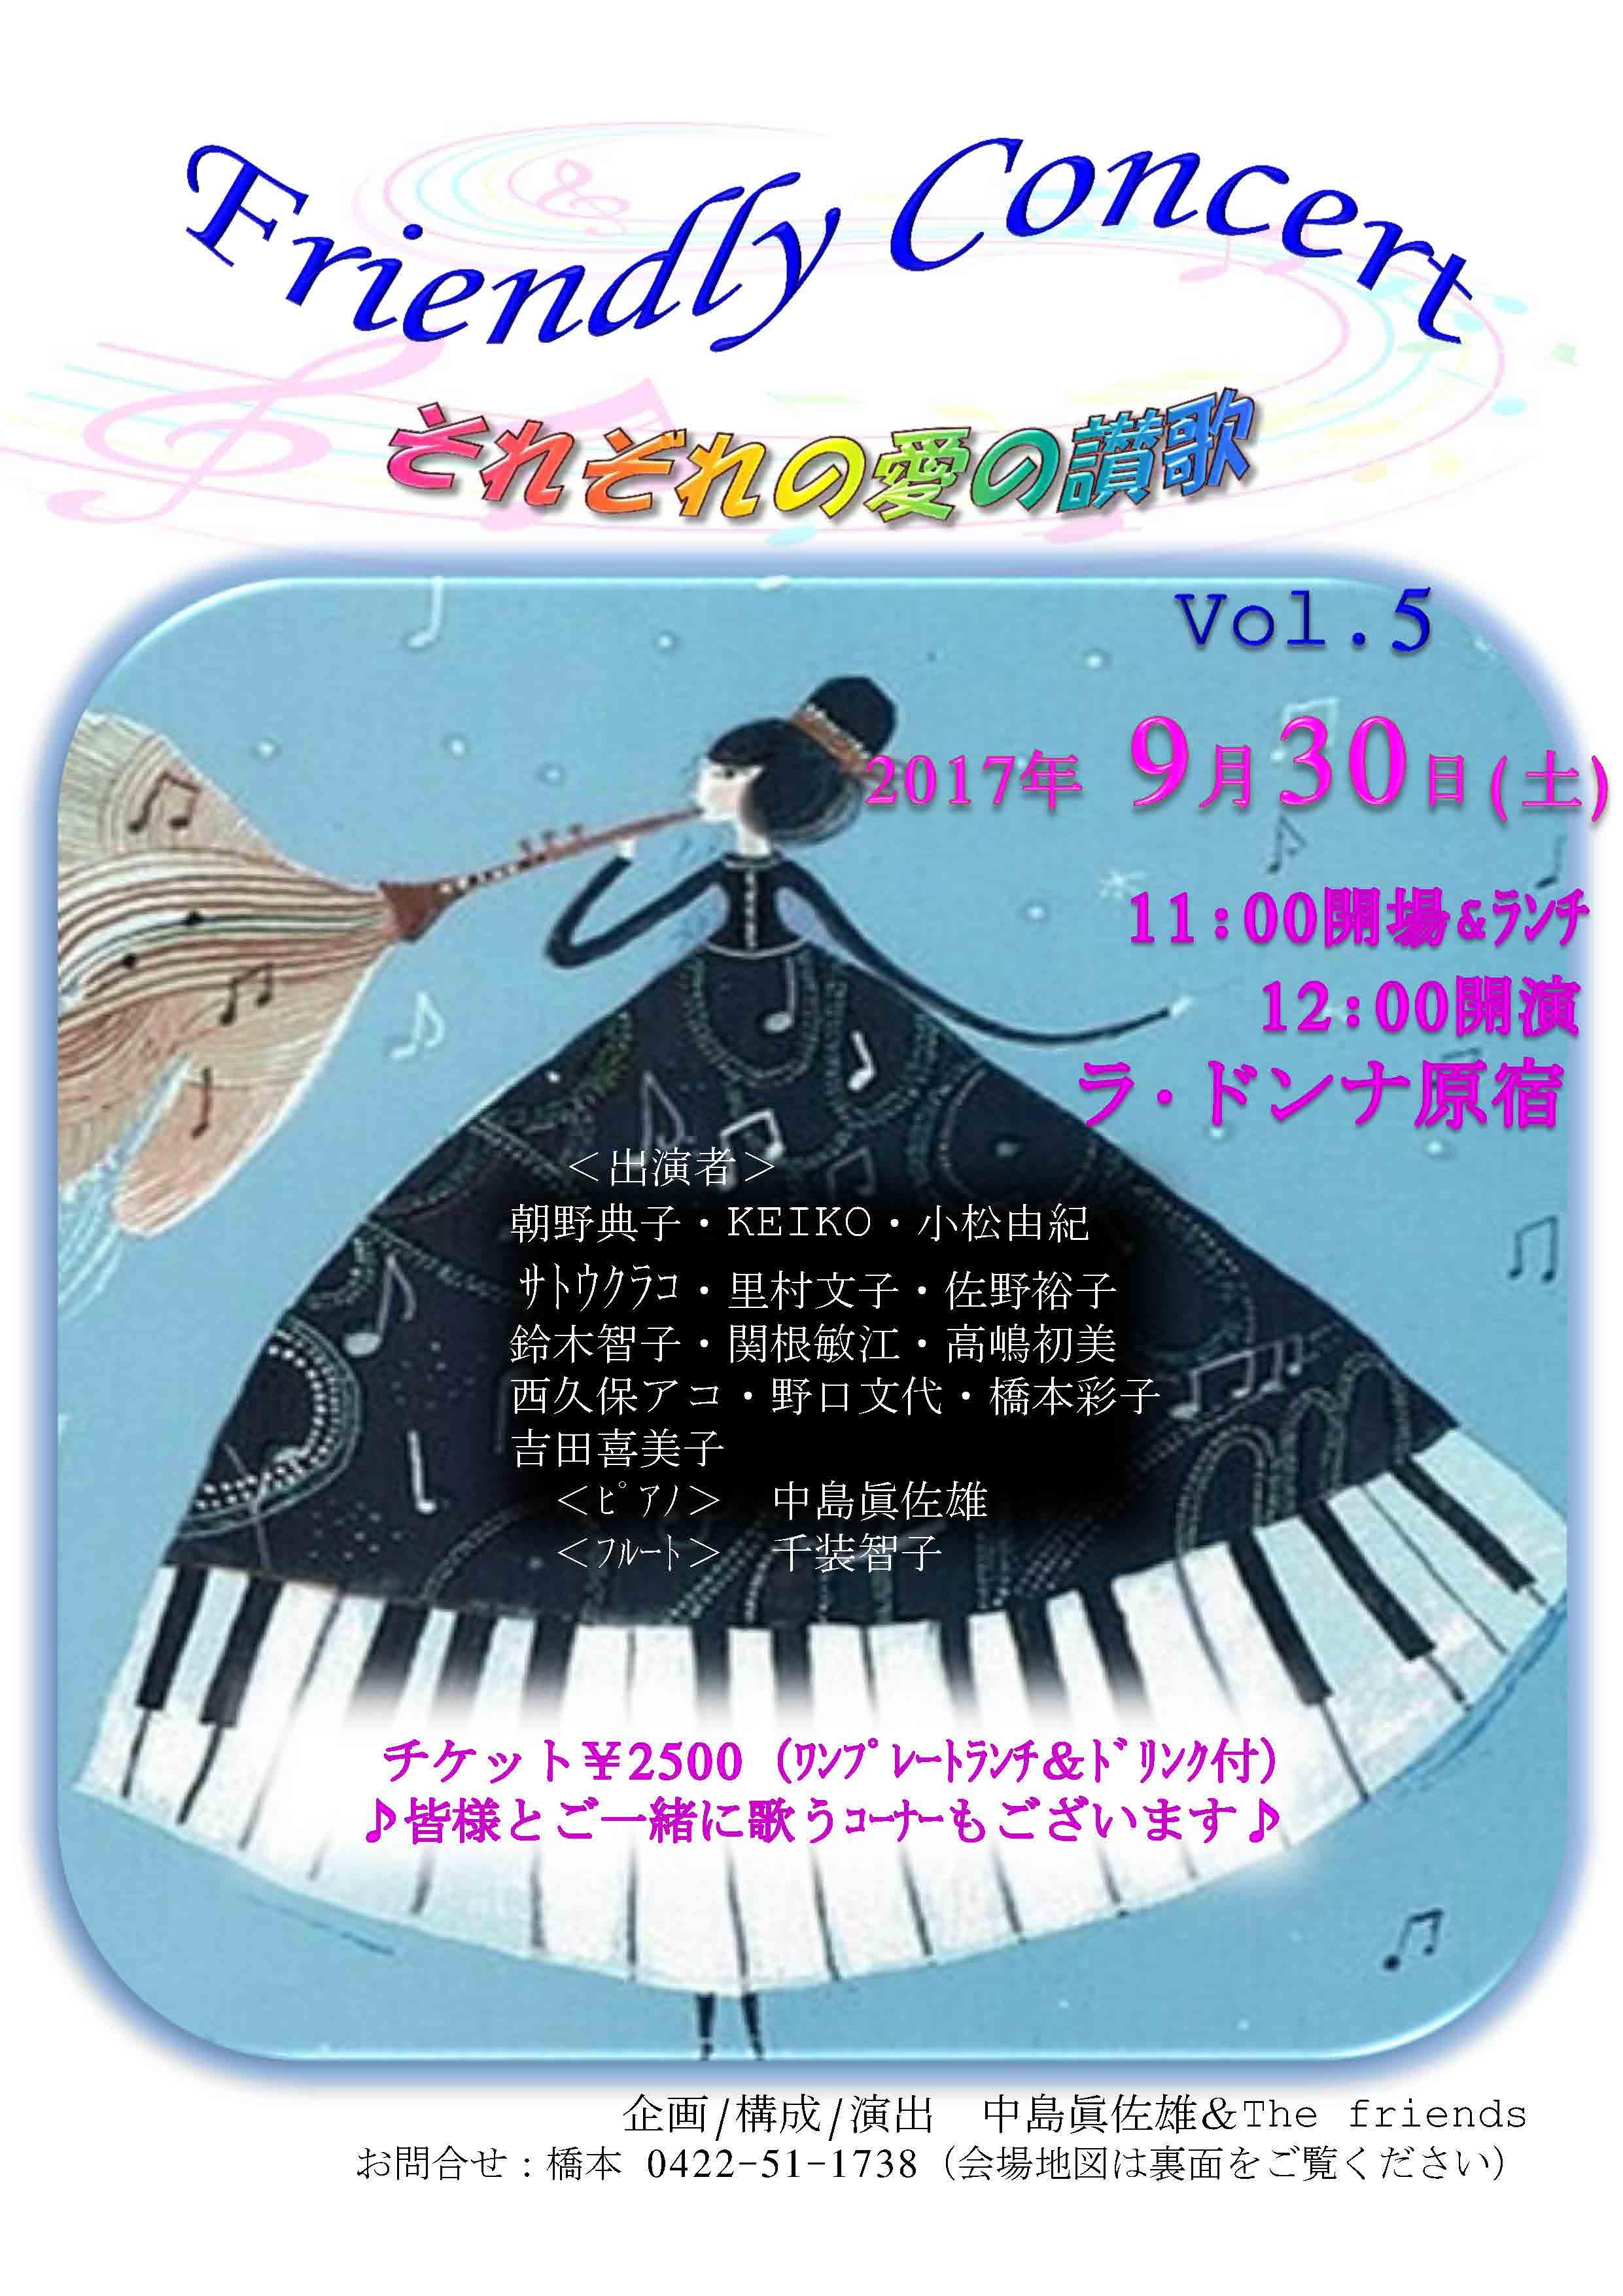 Friendly Concert それぞれの愛の賛歌 Vol.5